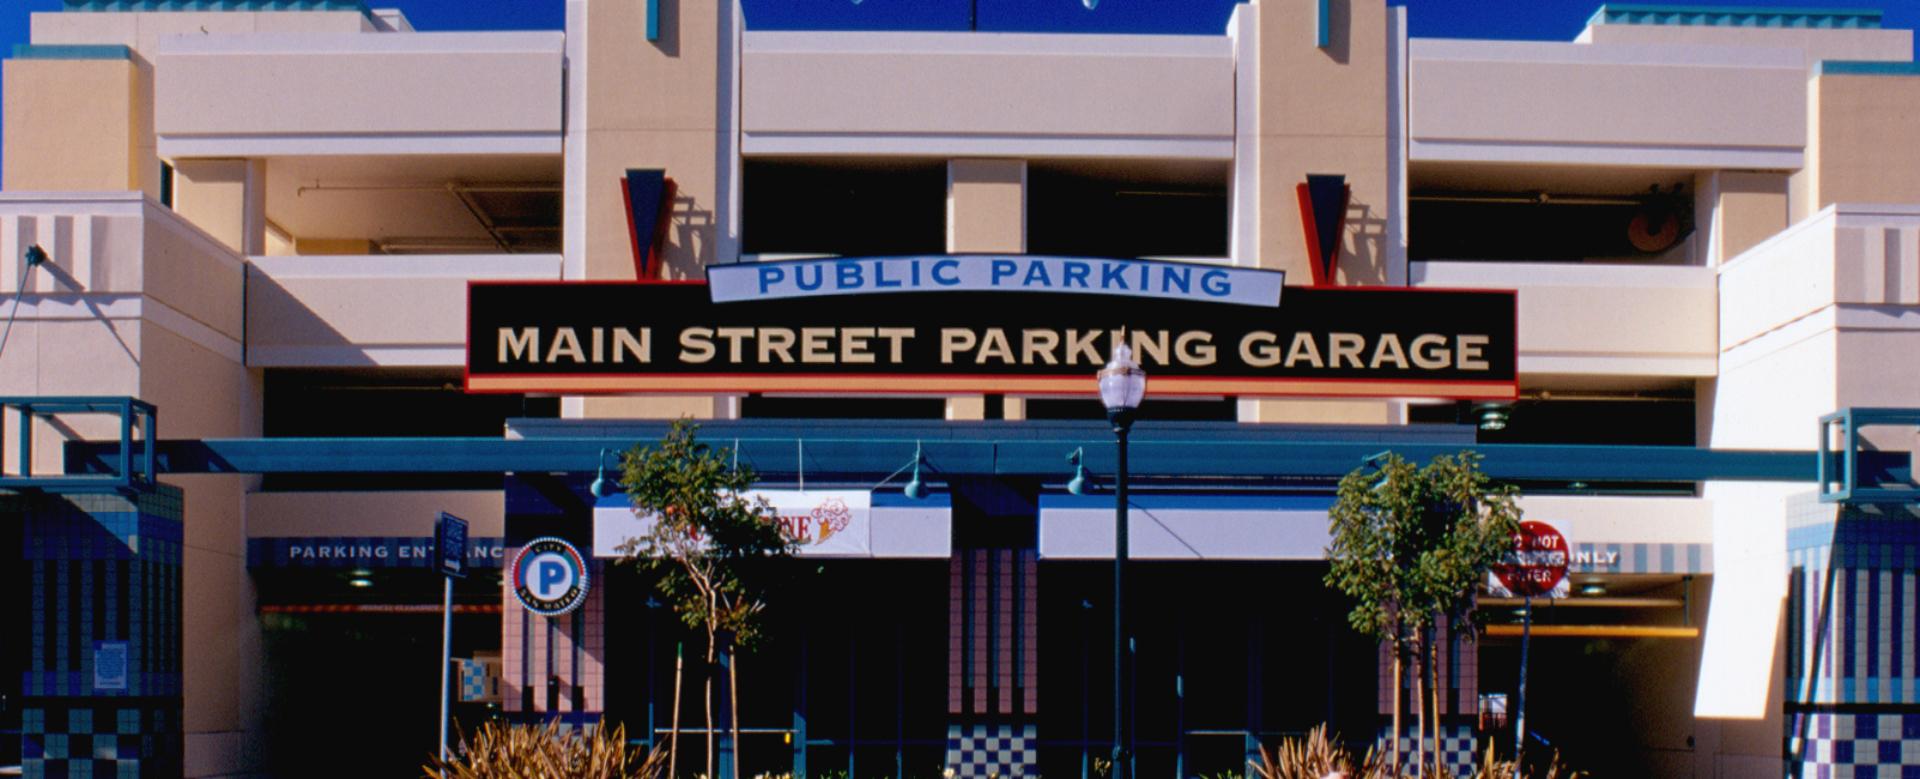 Main Street Parking Structure